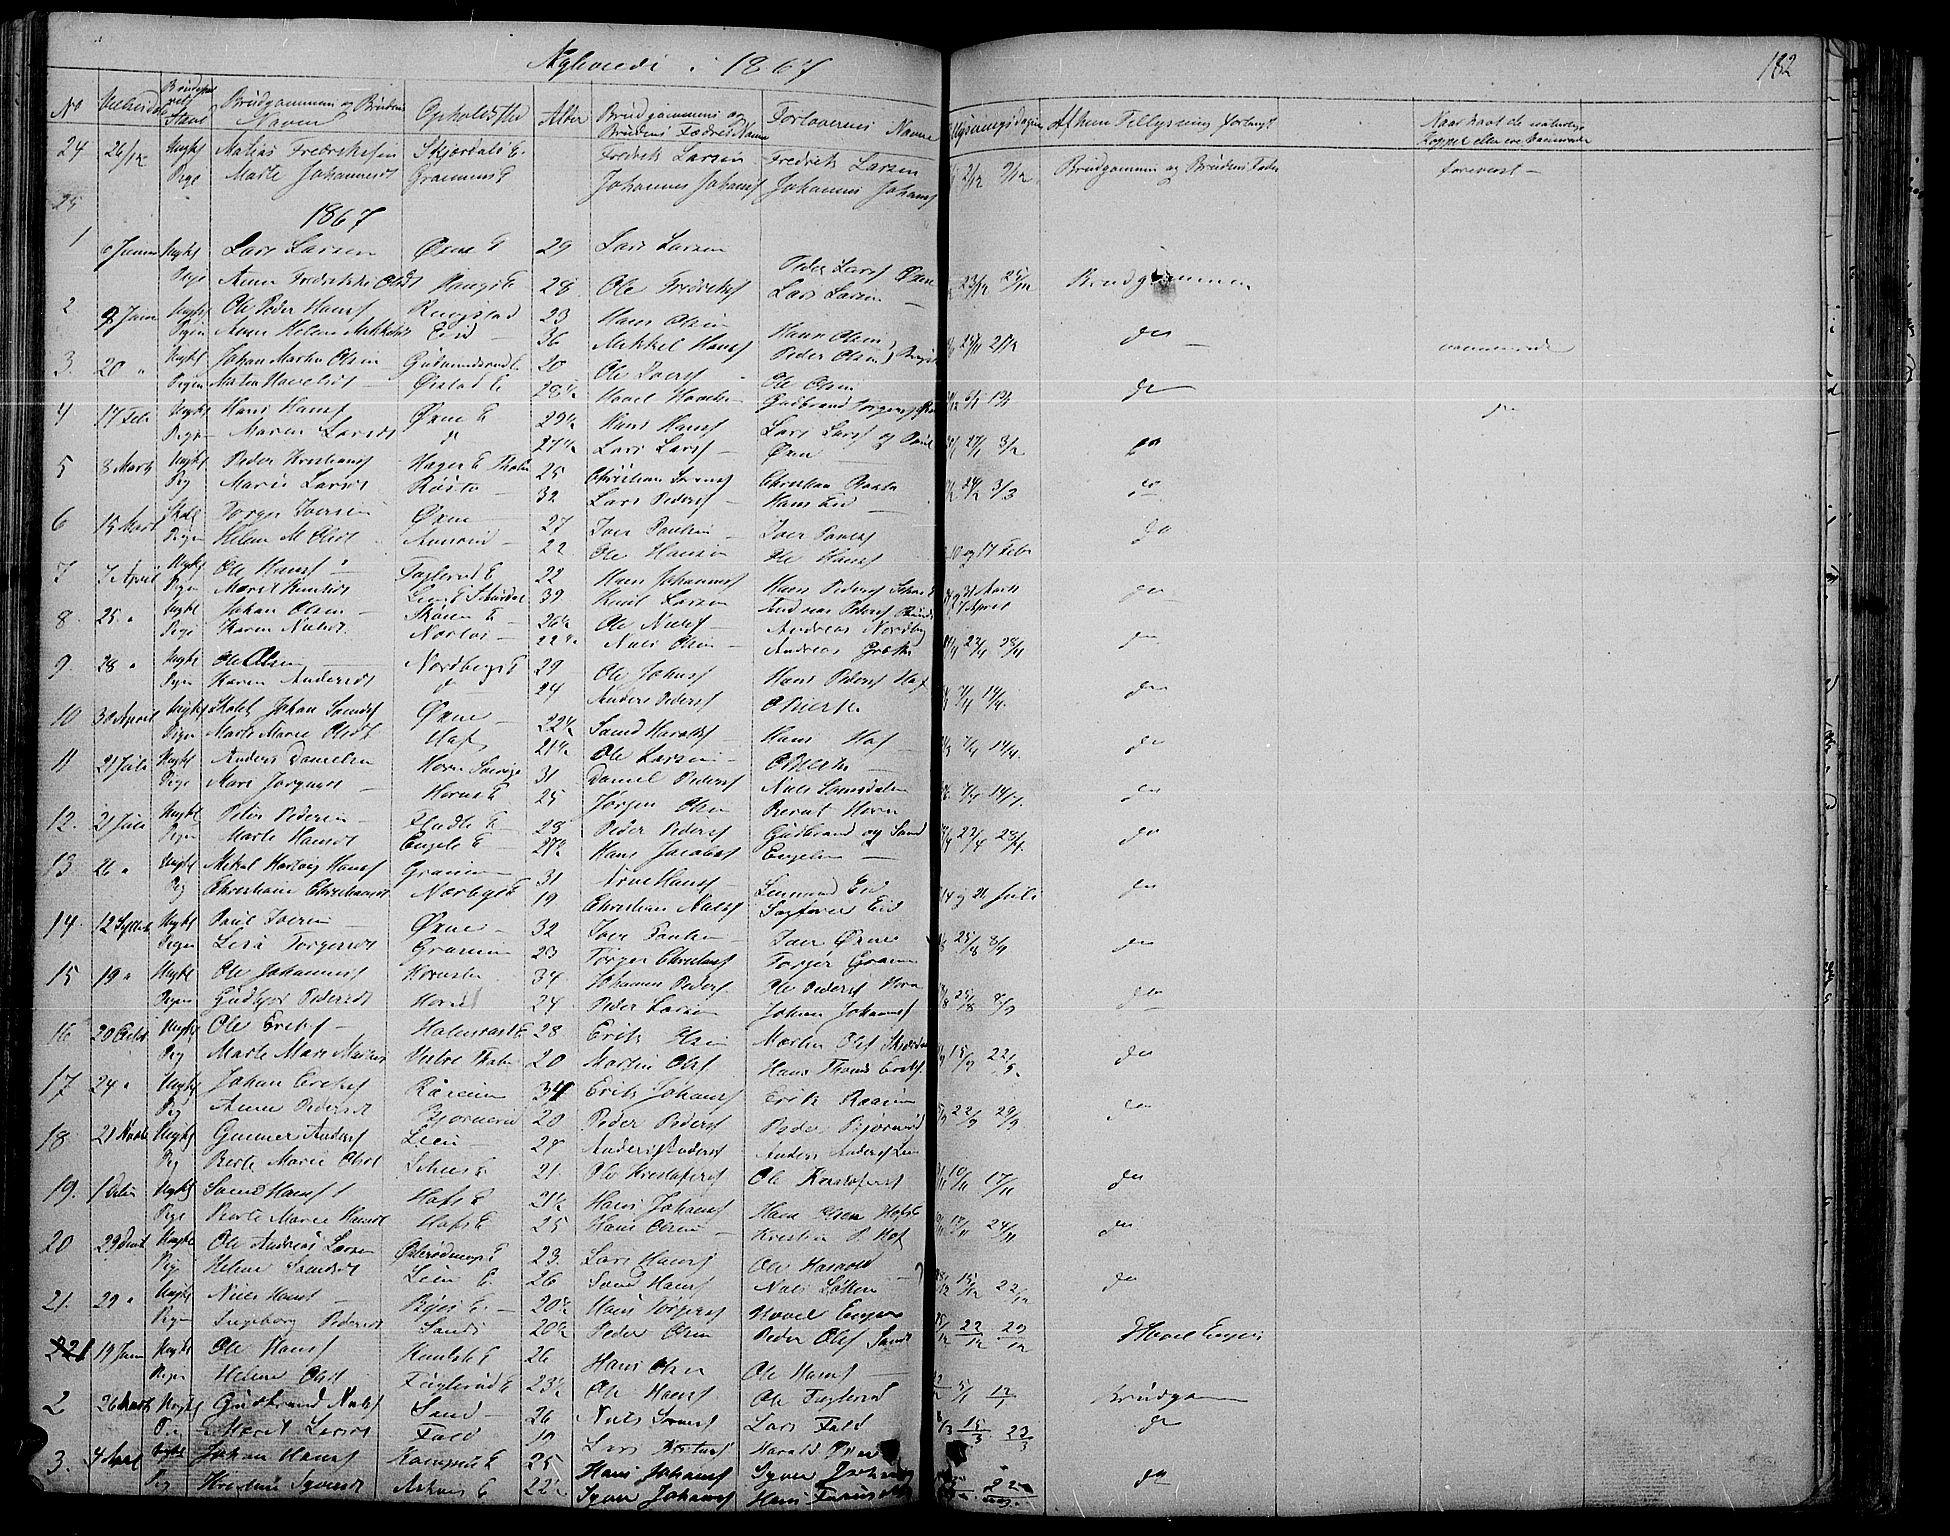 SAH, Søndre Land prestekontor, L/L0001: Klokkerbok nr. 1, 1849-1883, s. 182